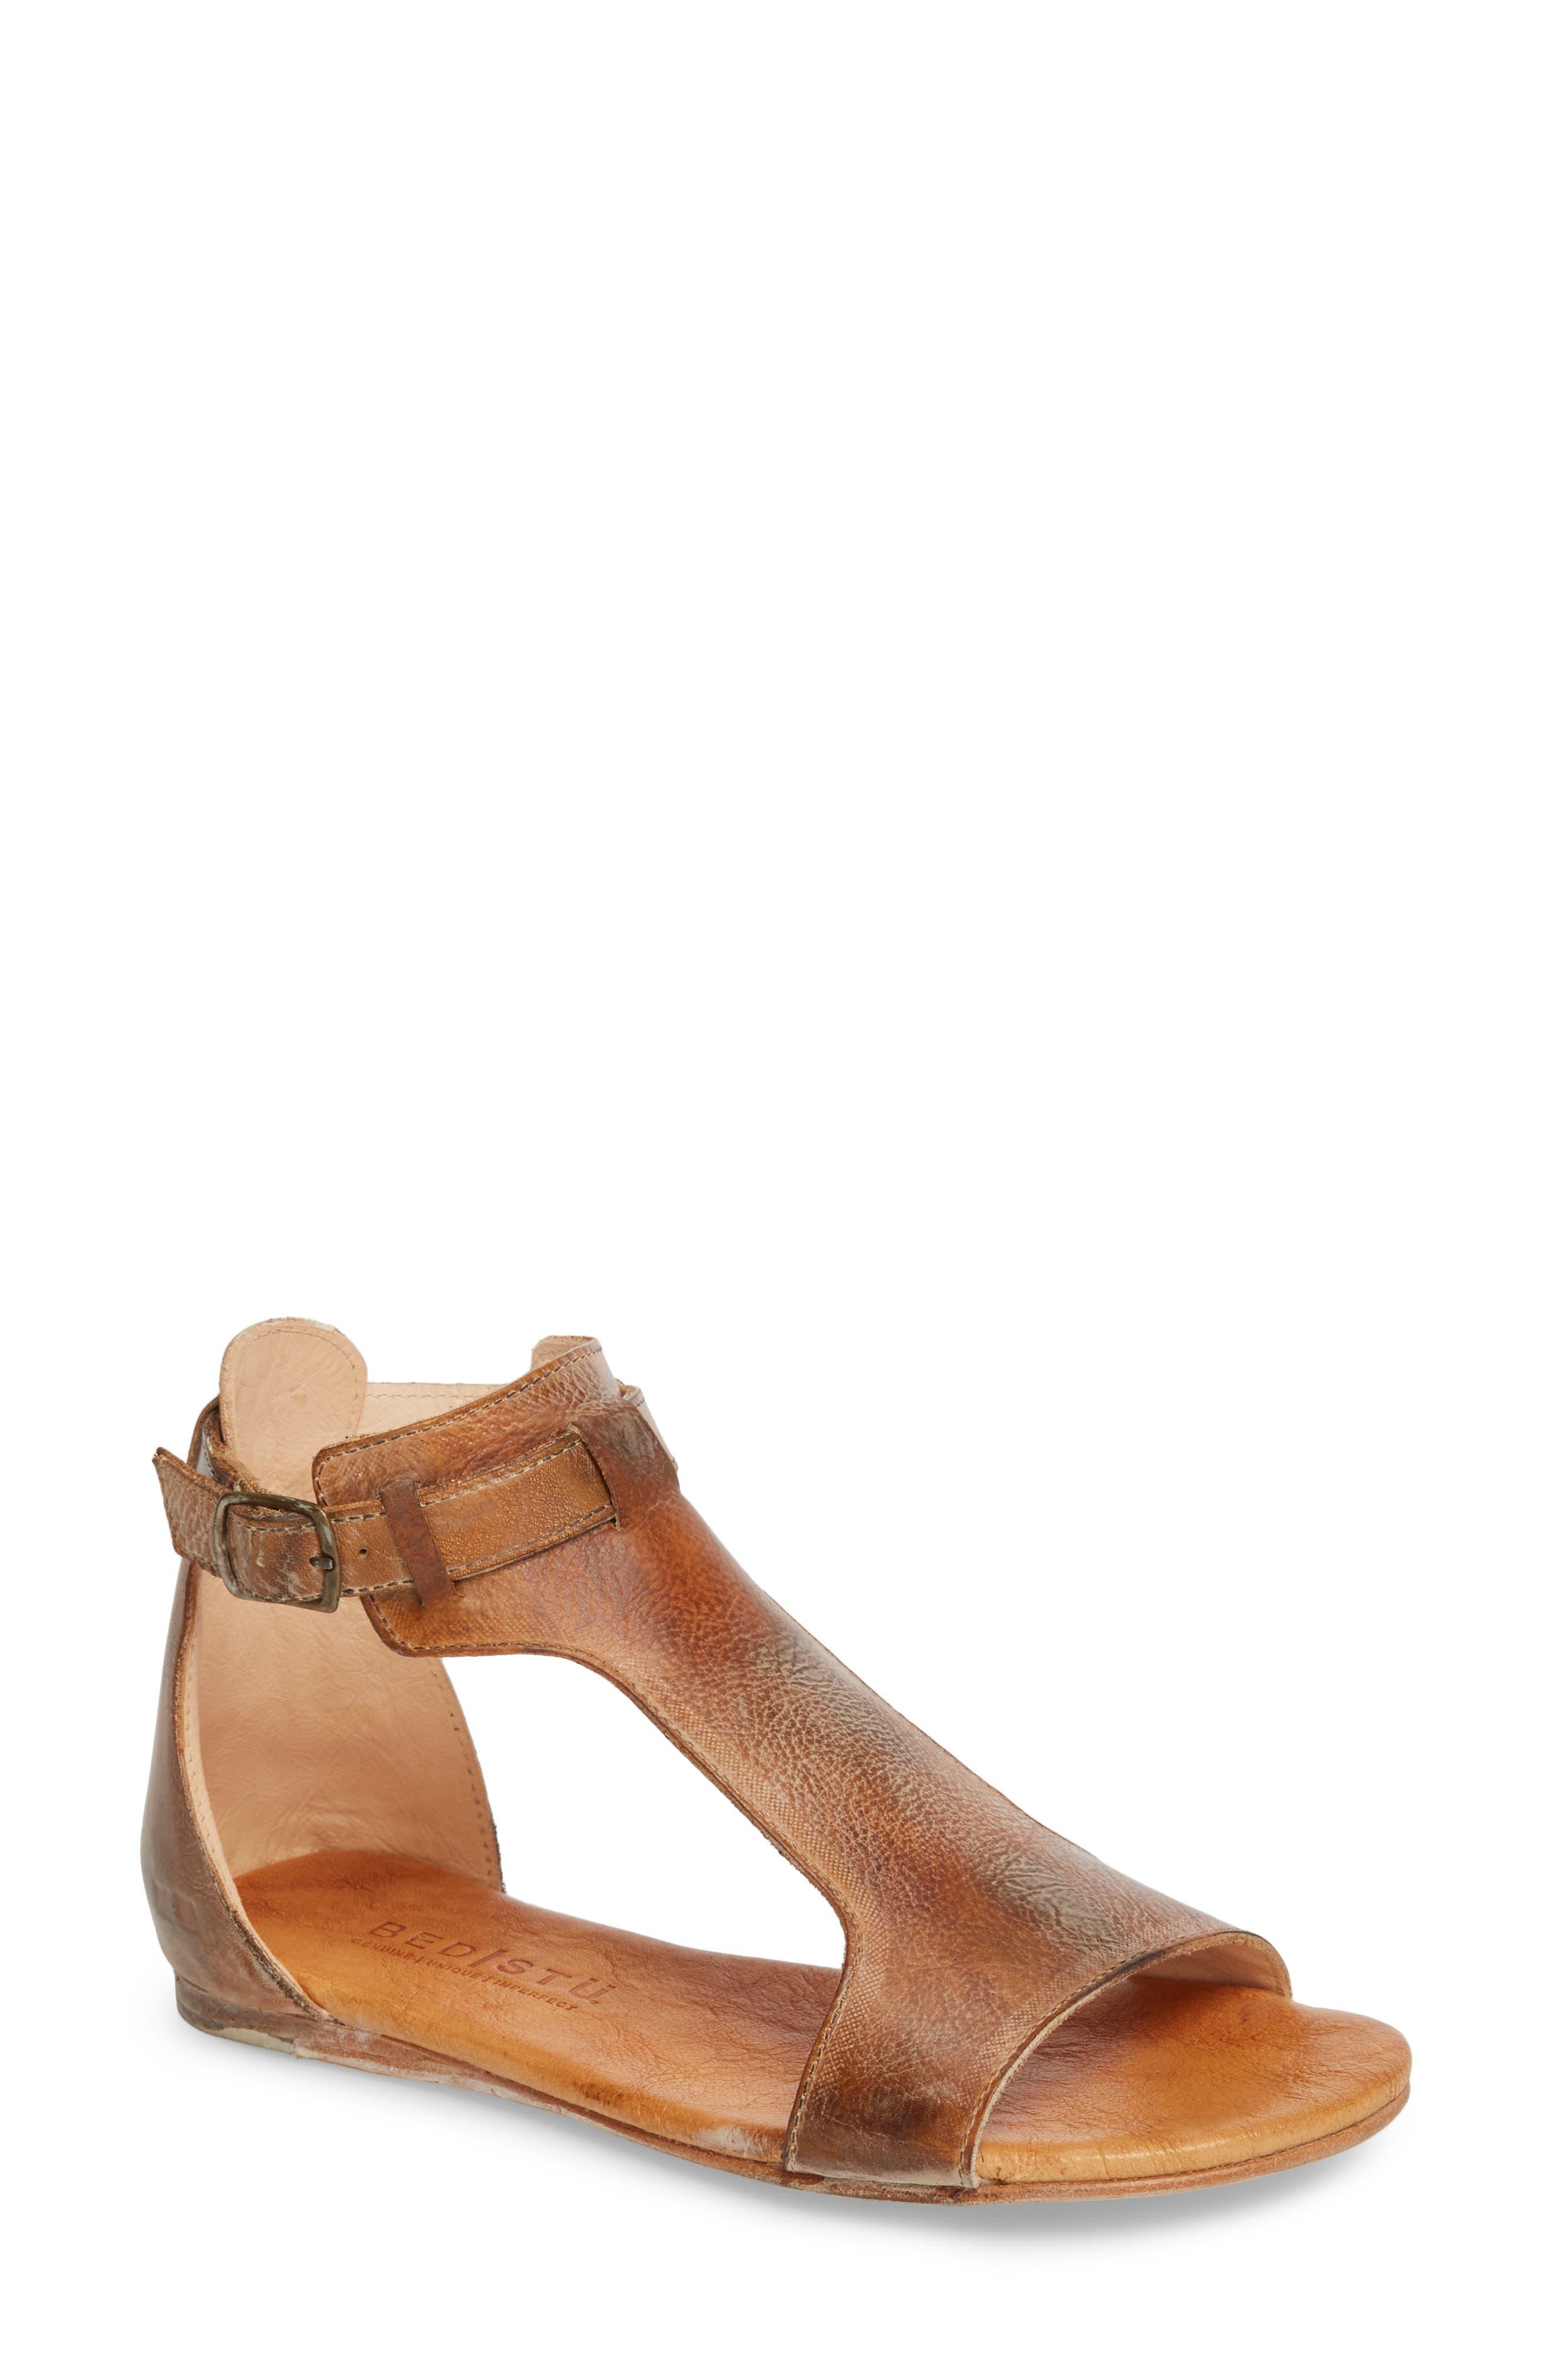 Sable Sandal,                             Main thumbnail 1, color,                             Tan/ White Leather